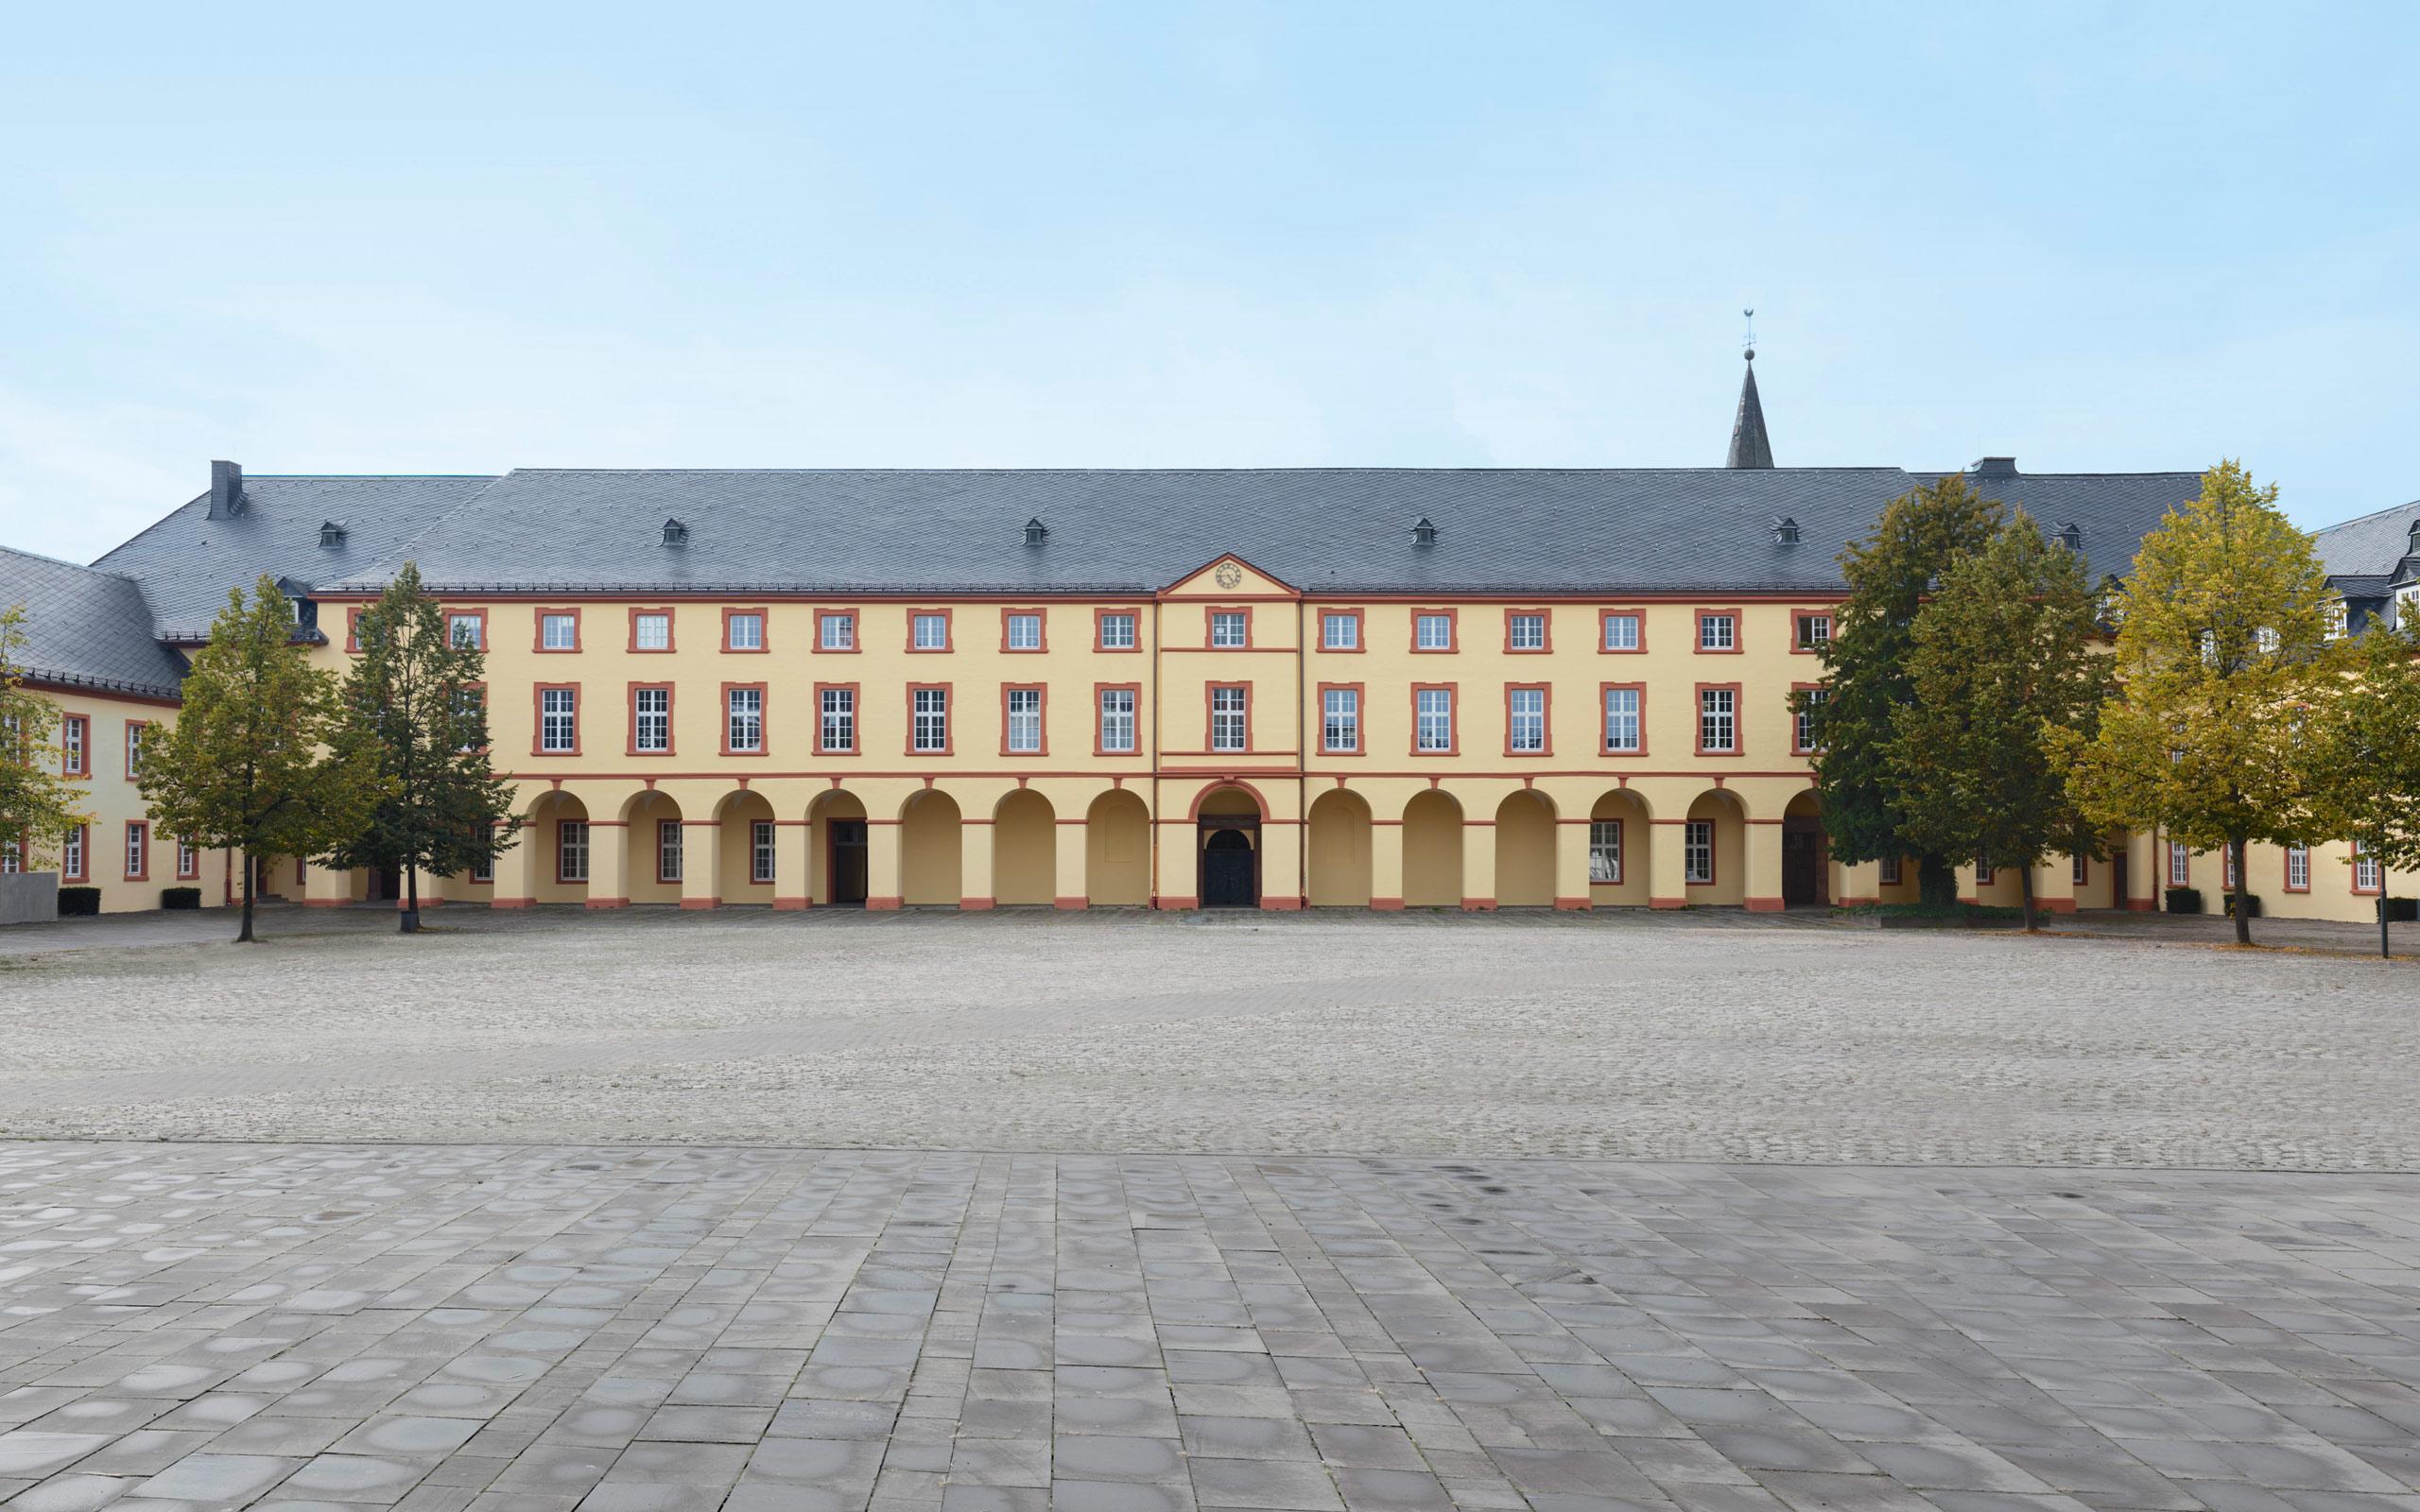 Campus unteres schloss universit t siegen for Universitat architektur